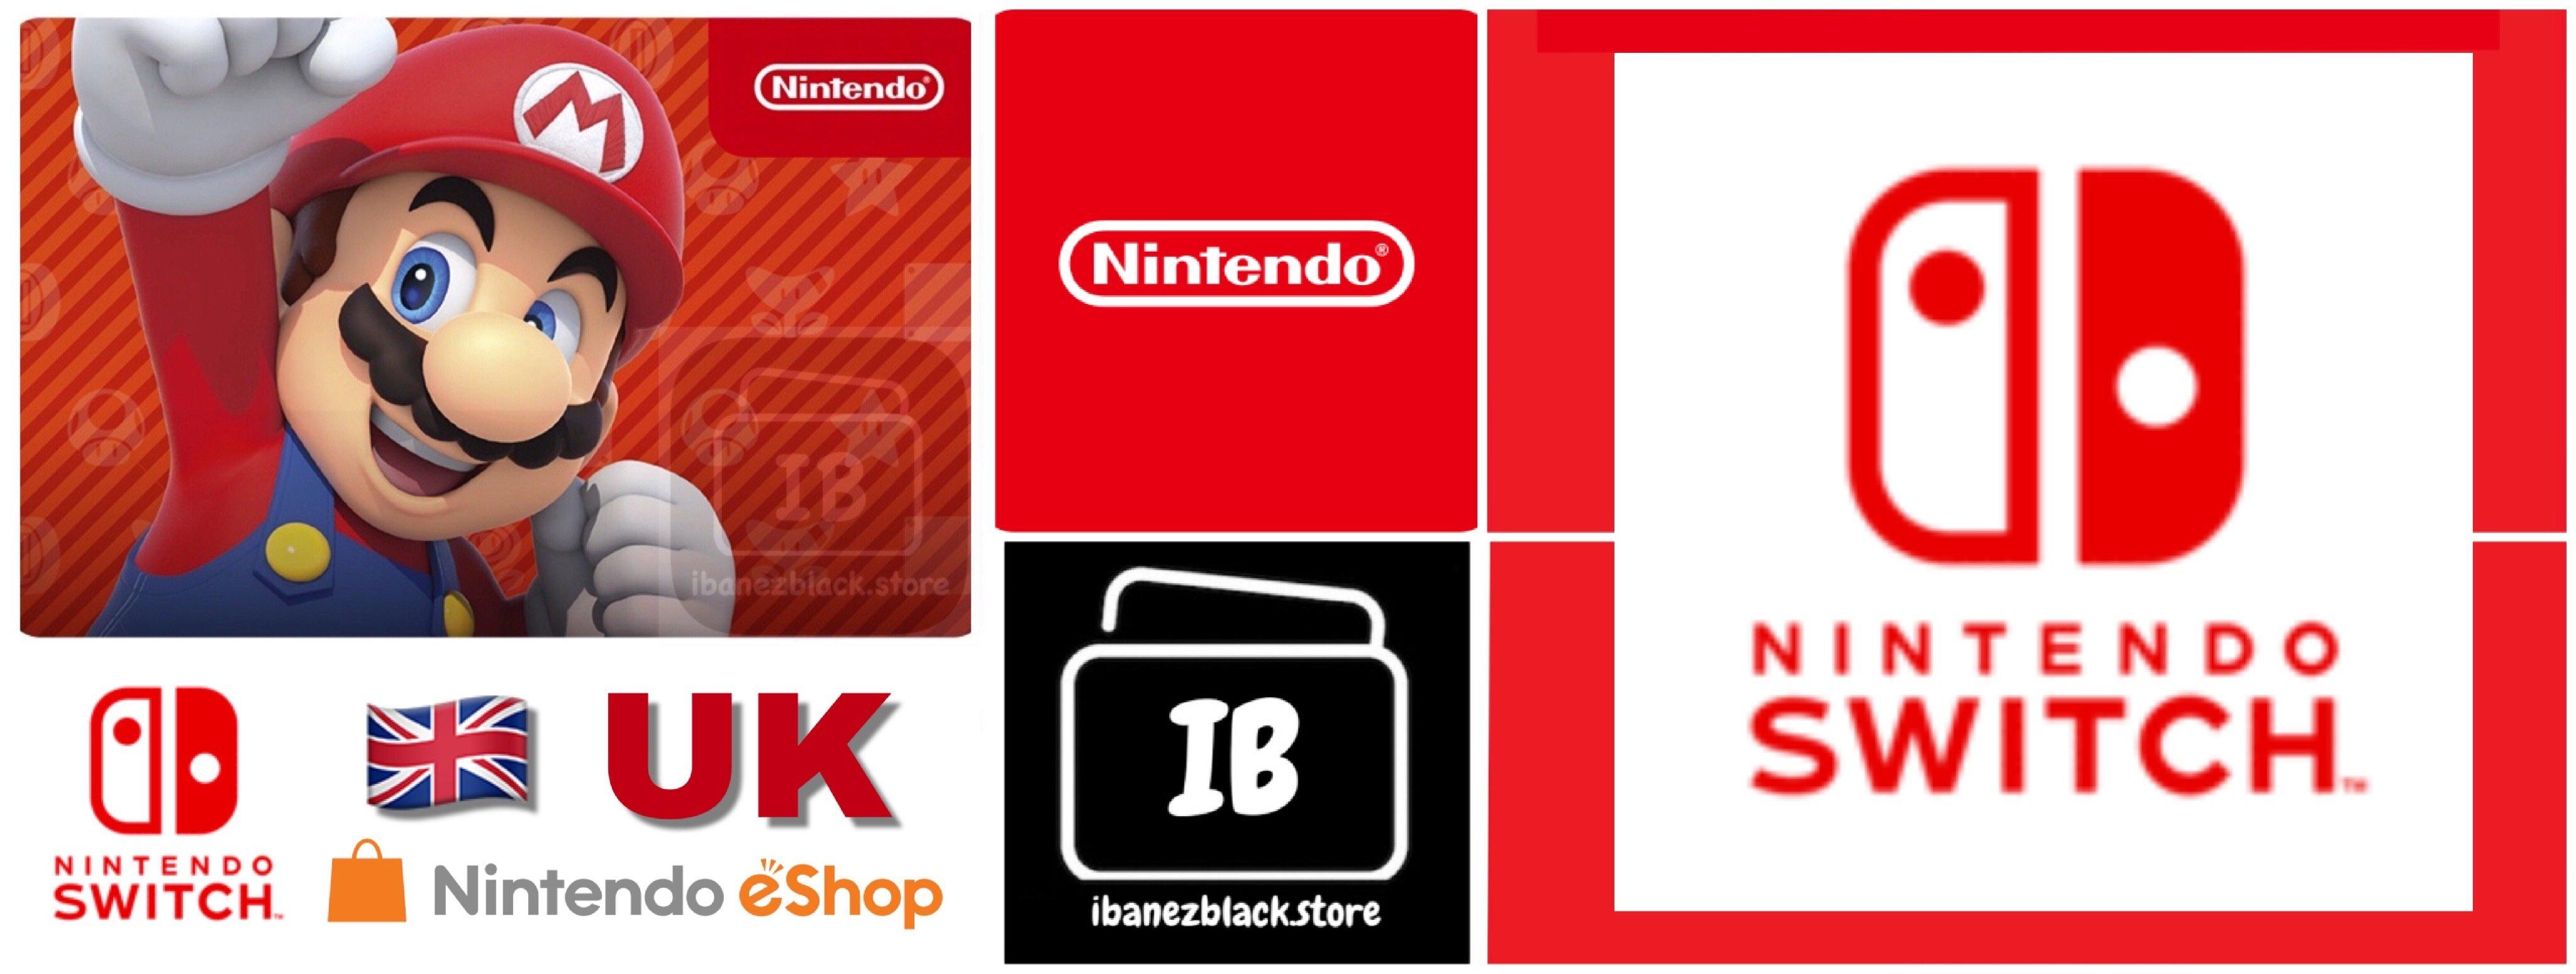 Nintendo eShop Card UK - Switch / Wii U / 3DS